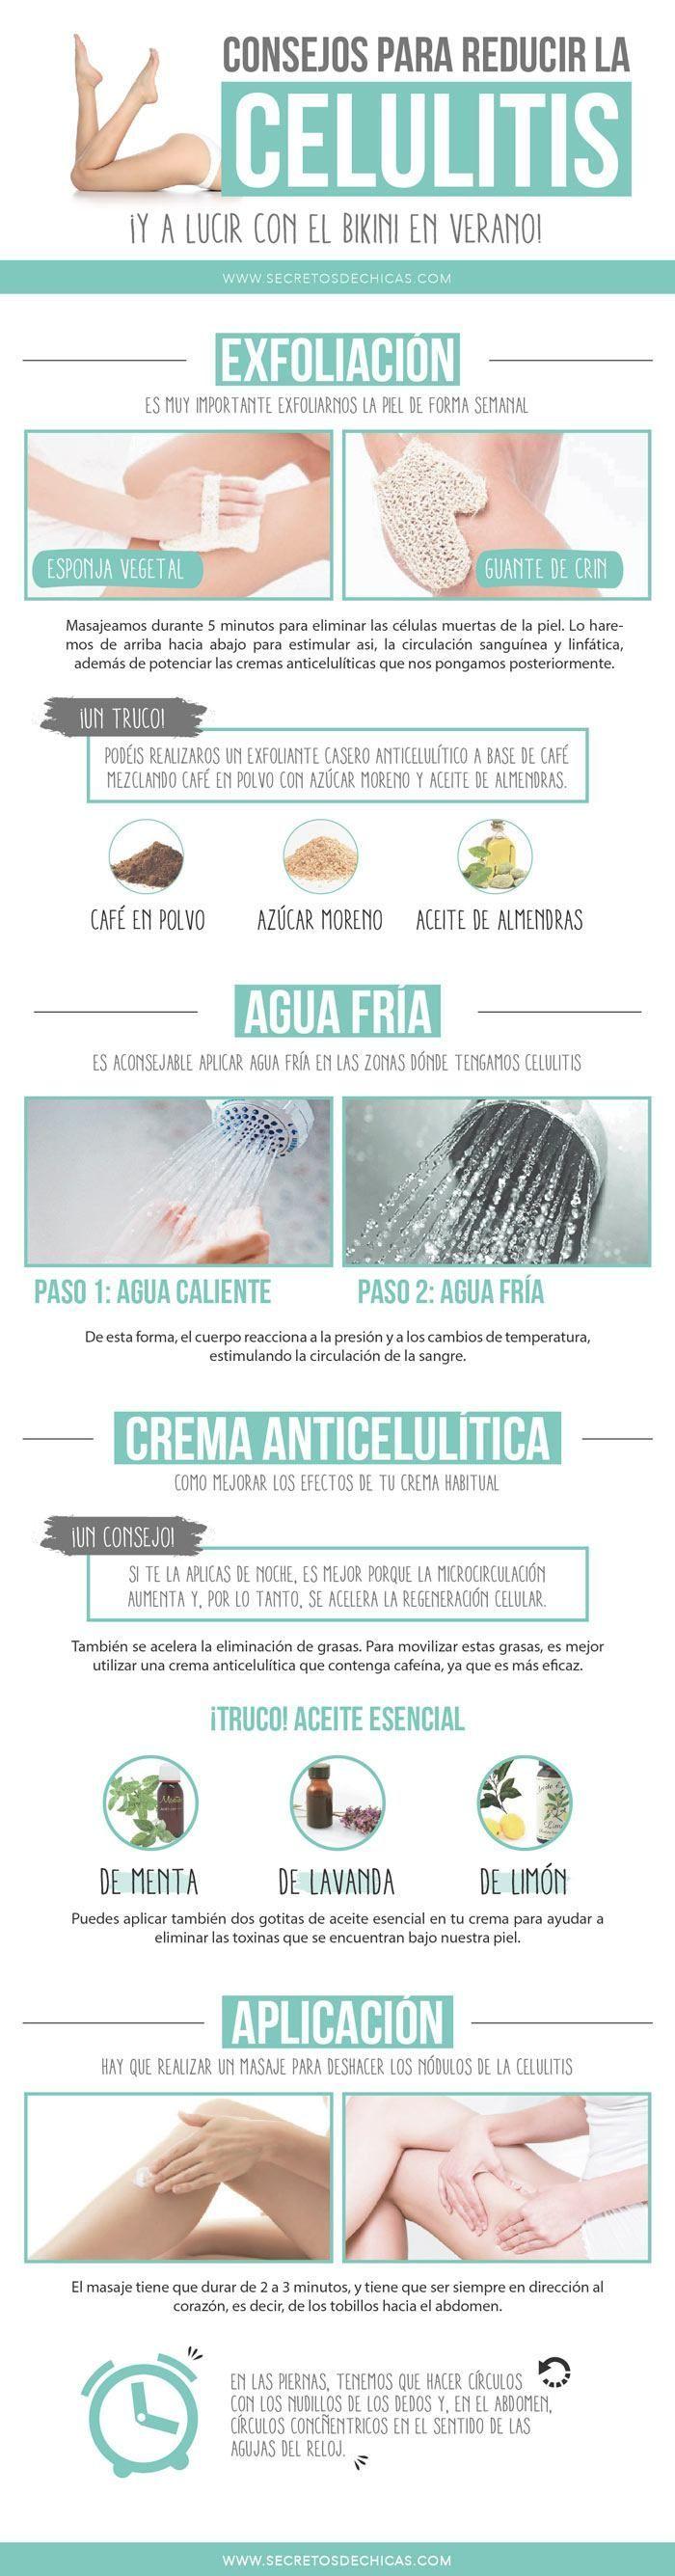 Celulitis web